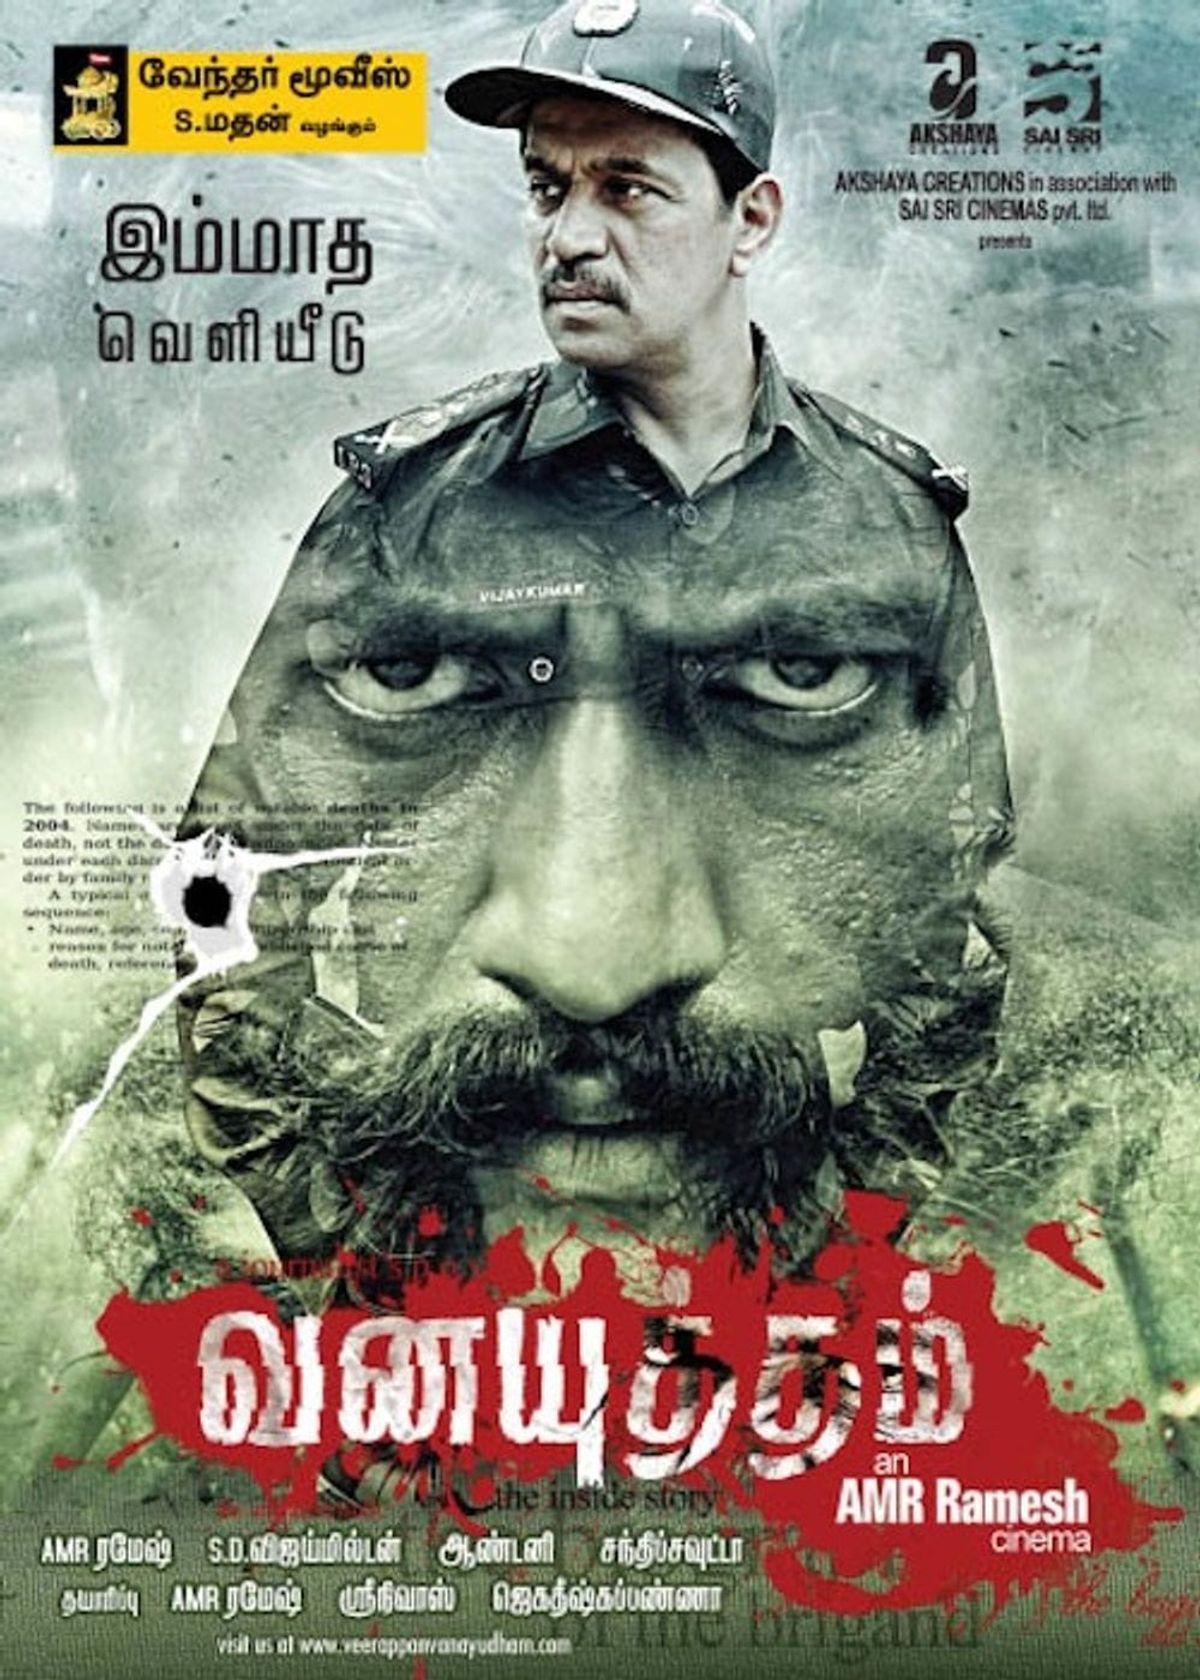 Jayabalan Best Movies, TV Shows and Web Series List